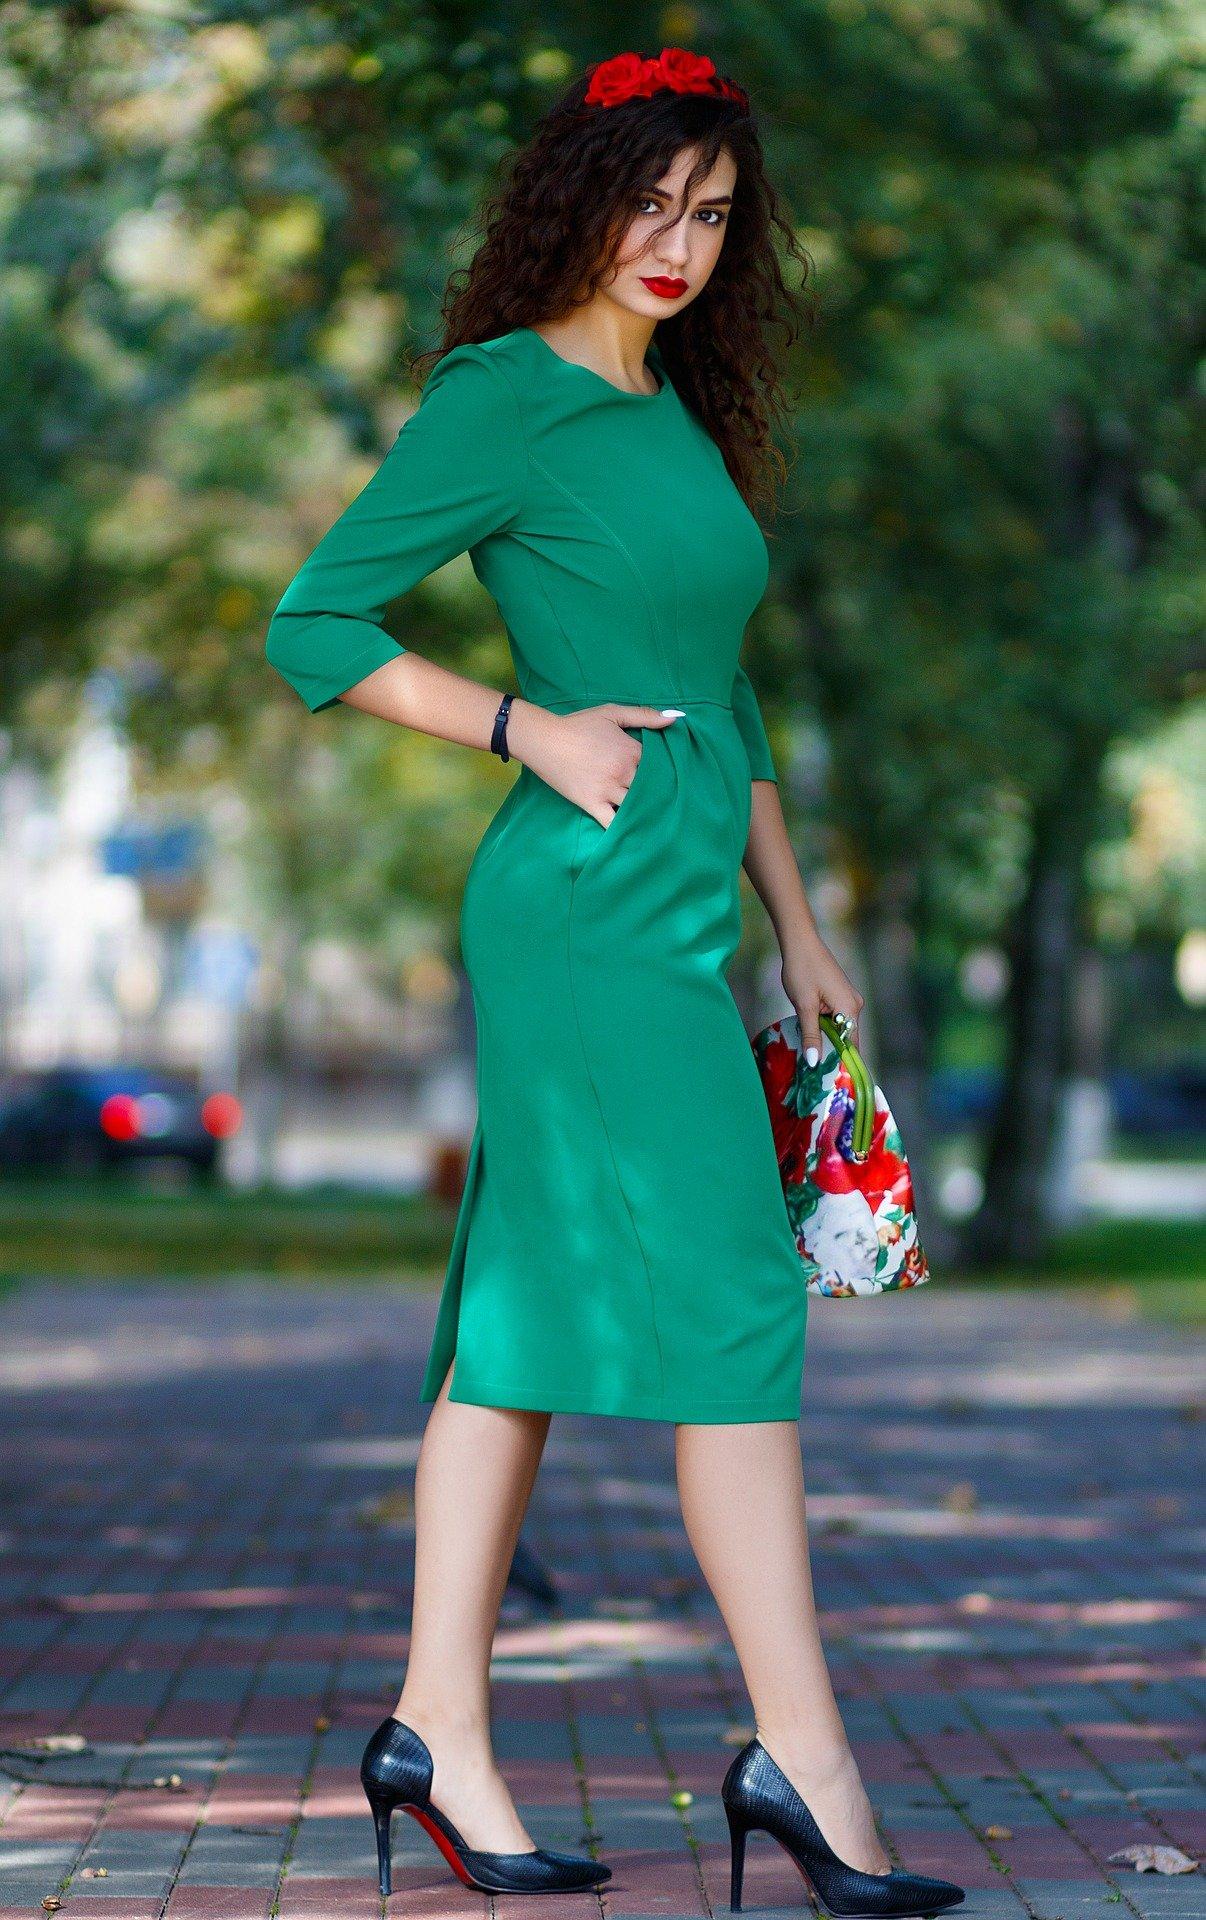 chaussuers avec robe verte